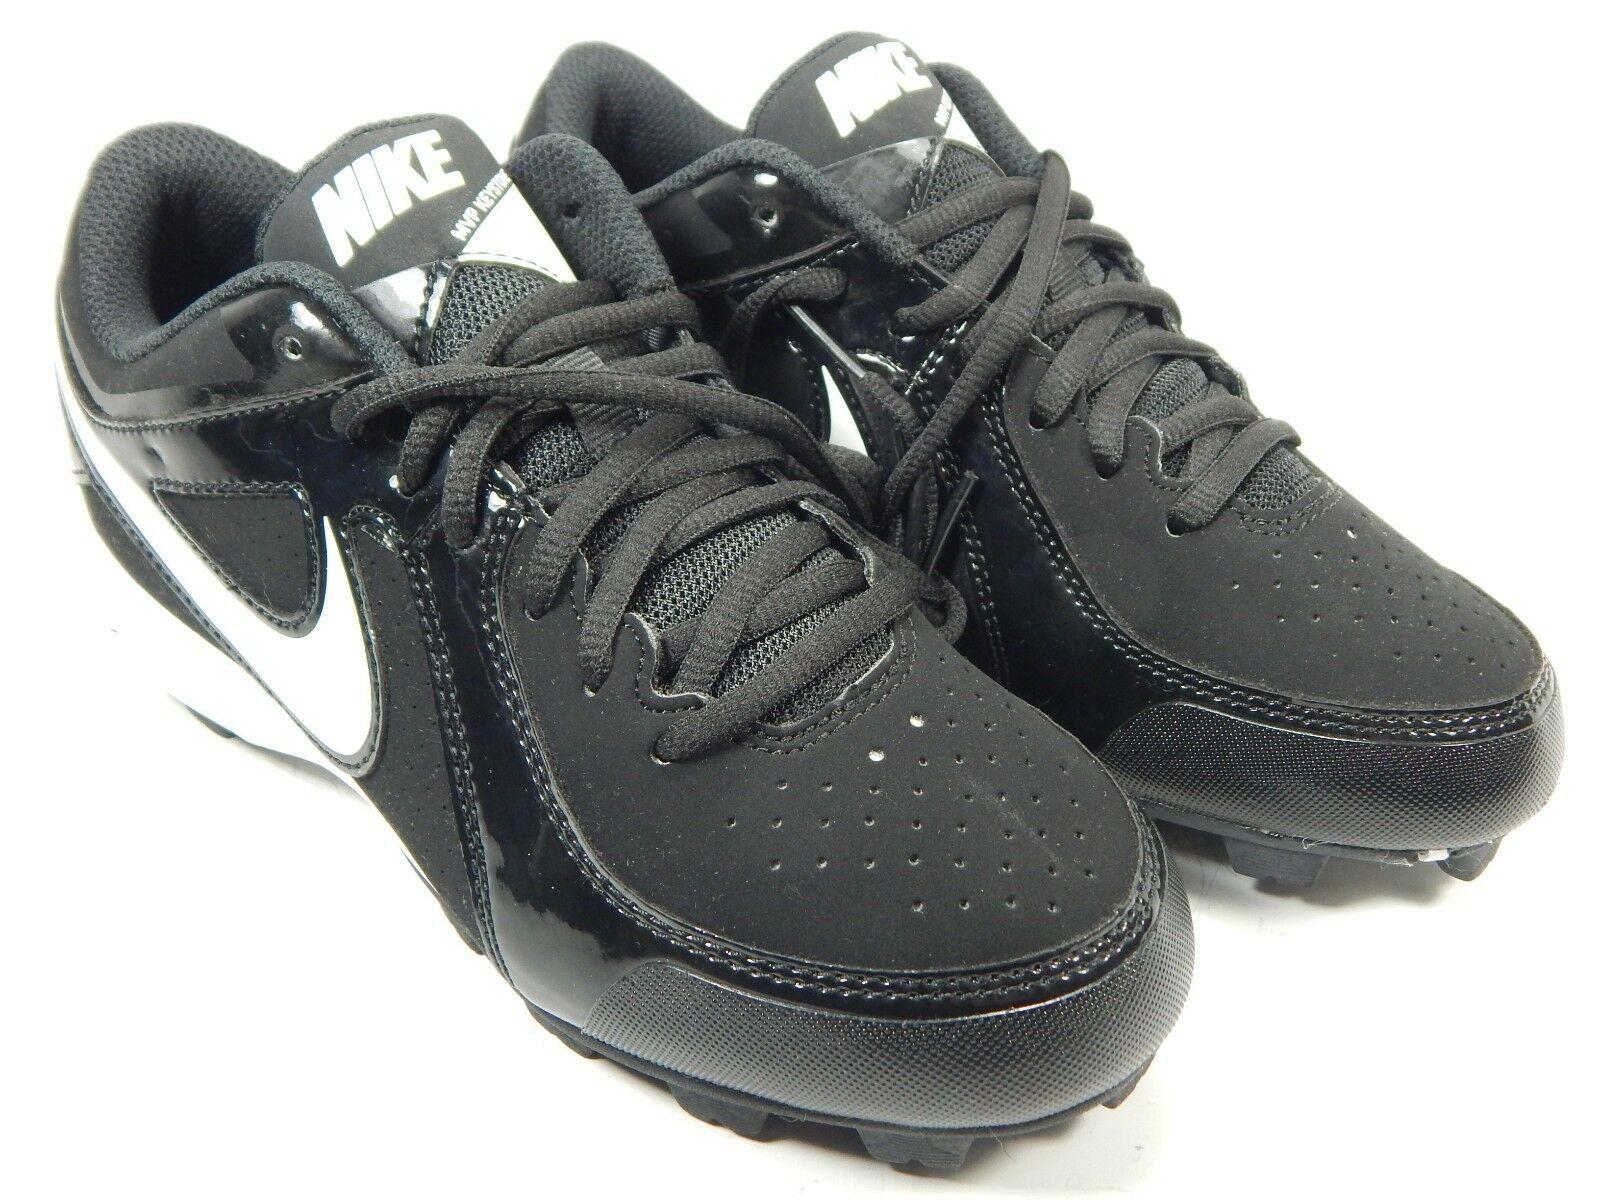 sports shoes bee4d ffecb Nike da Bambino MVP Keystone Basso Baseball Tacchetti Ragazzi Taglia 3.5 Y  -  29.53